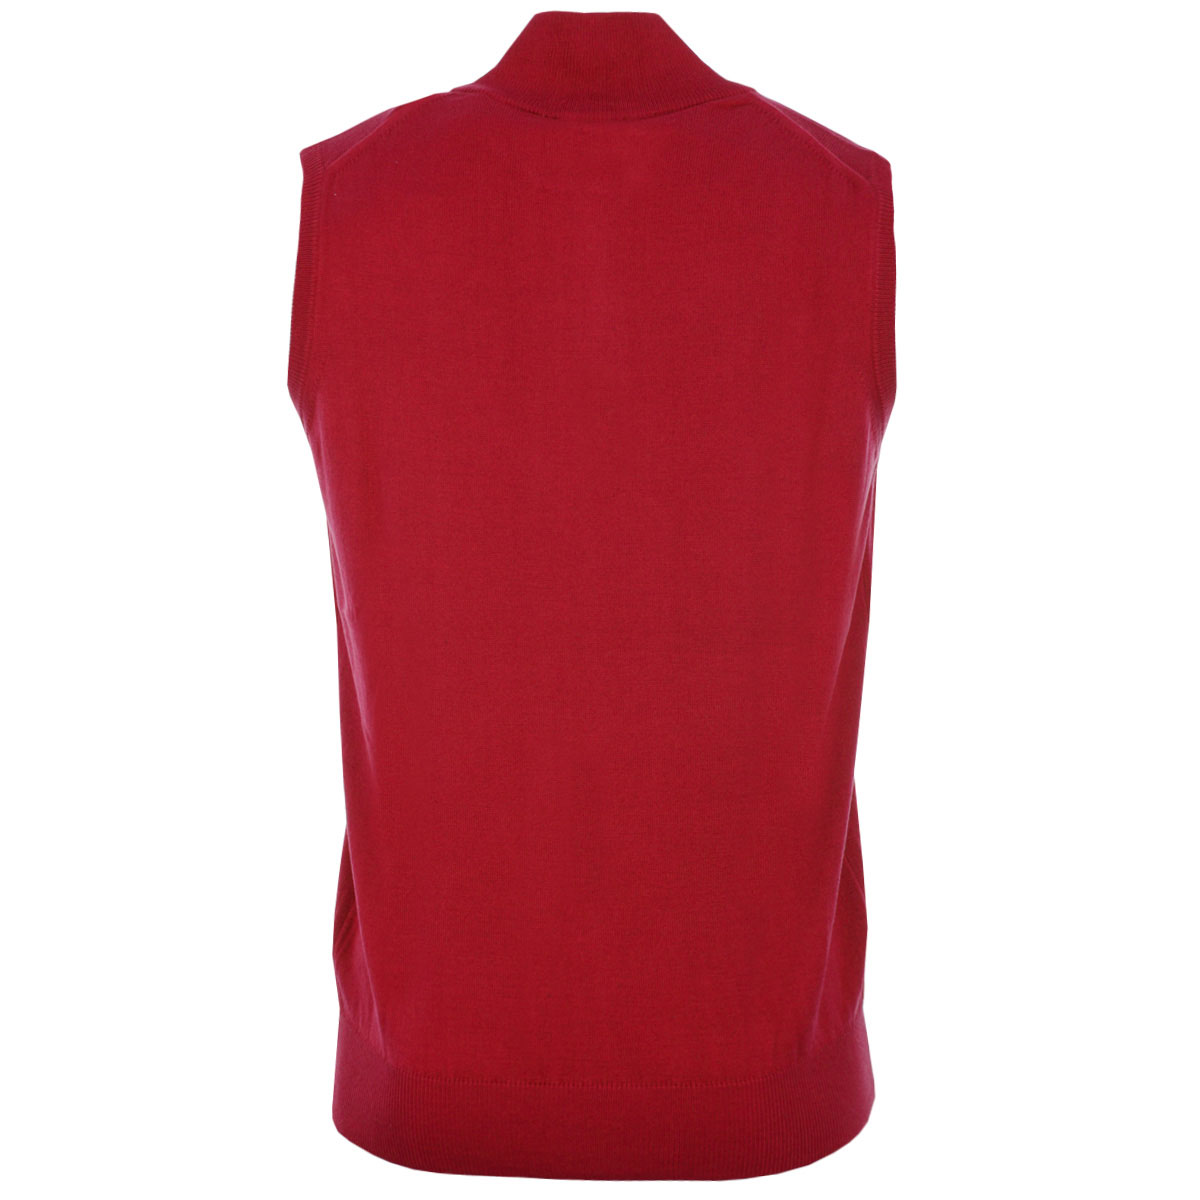 Calvin-Klein-Golf-Mens-CK-1-4-Zip-Sleeveless-Sweater-Vest-Gilet-27-OFF-RRP thumbnail 3